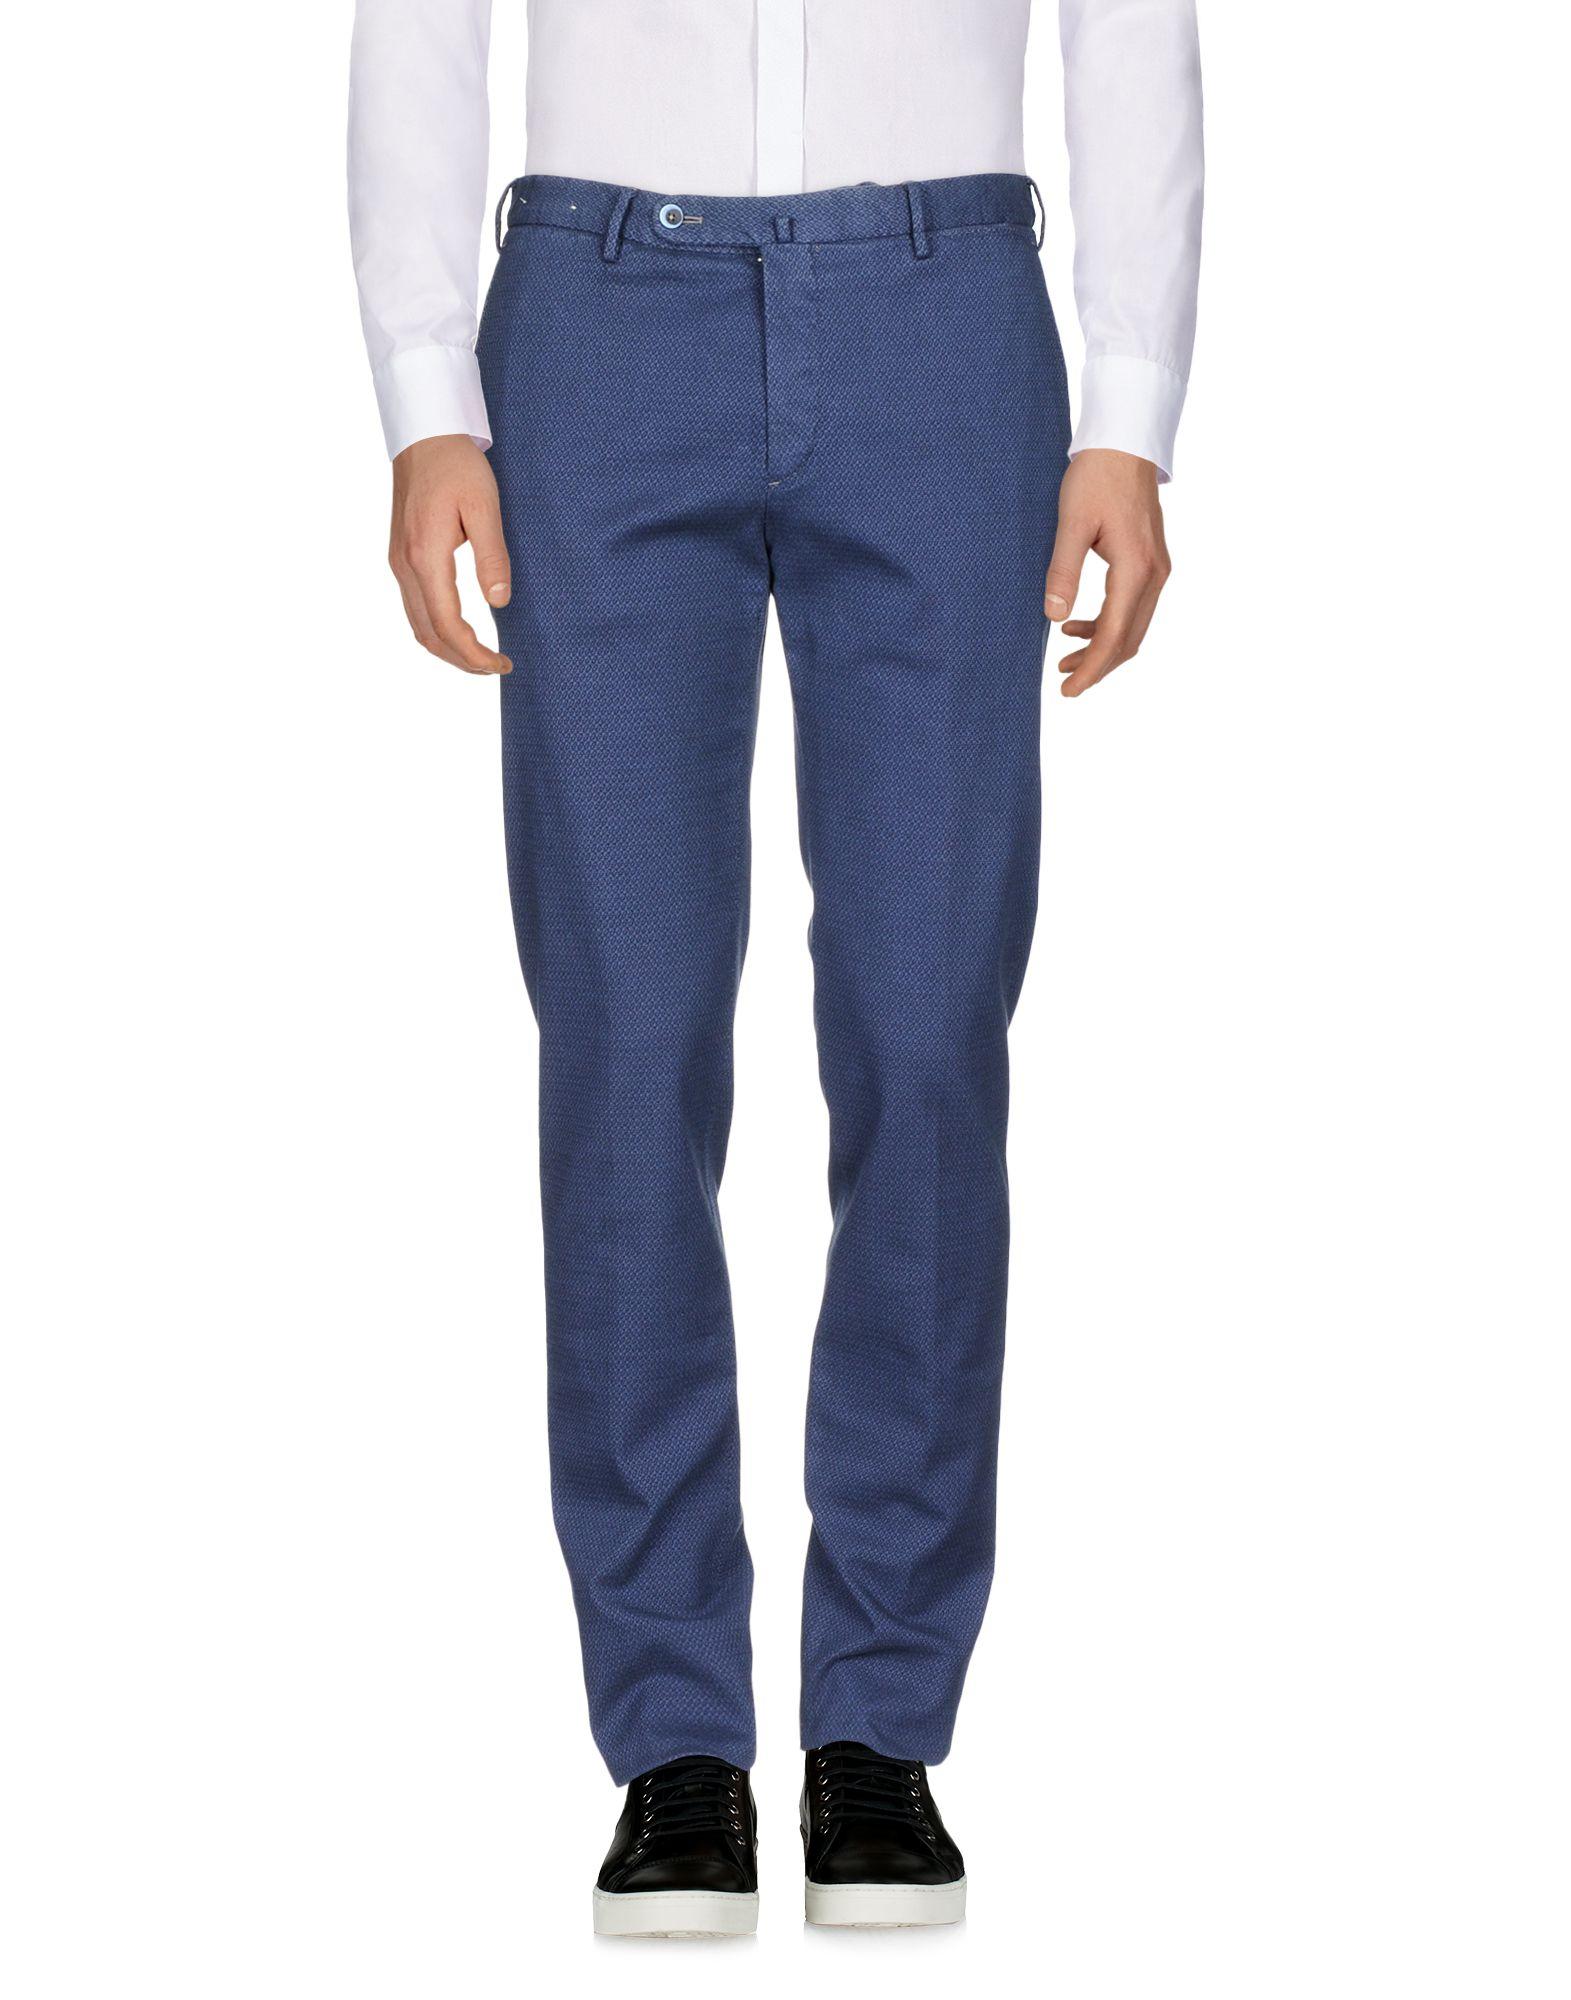 Chinos G.T.A. Manifattura Pantaloni Donna - Acquista online su